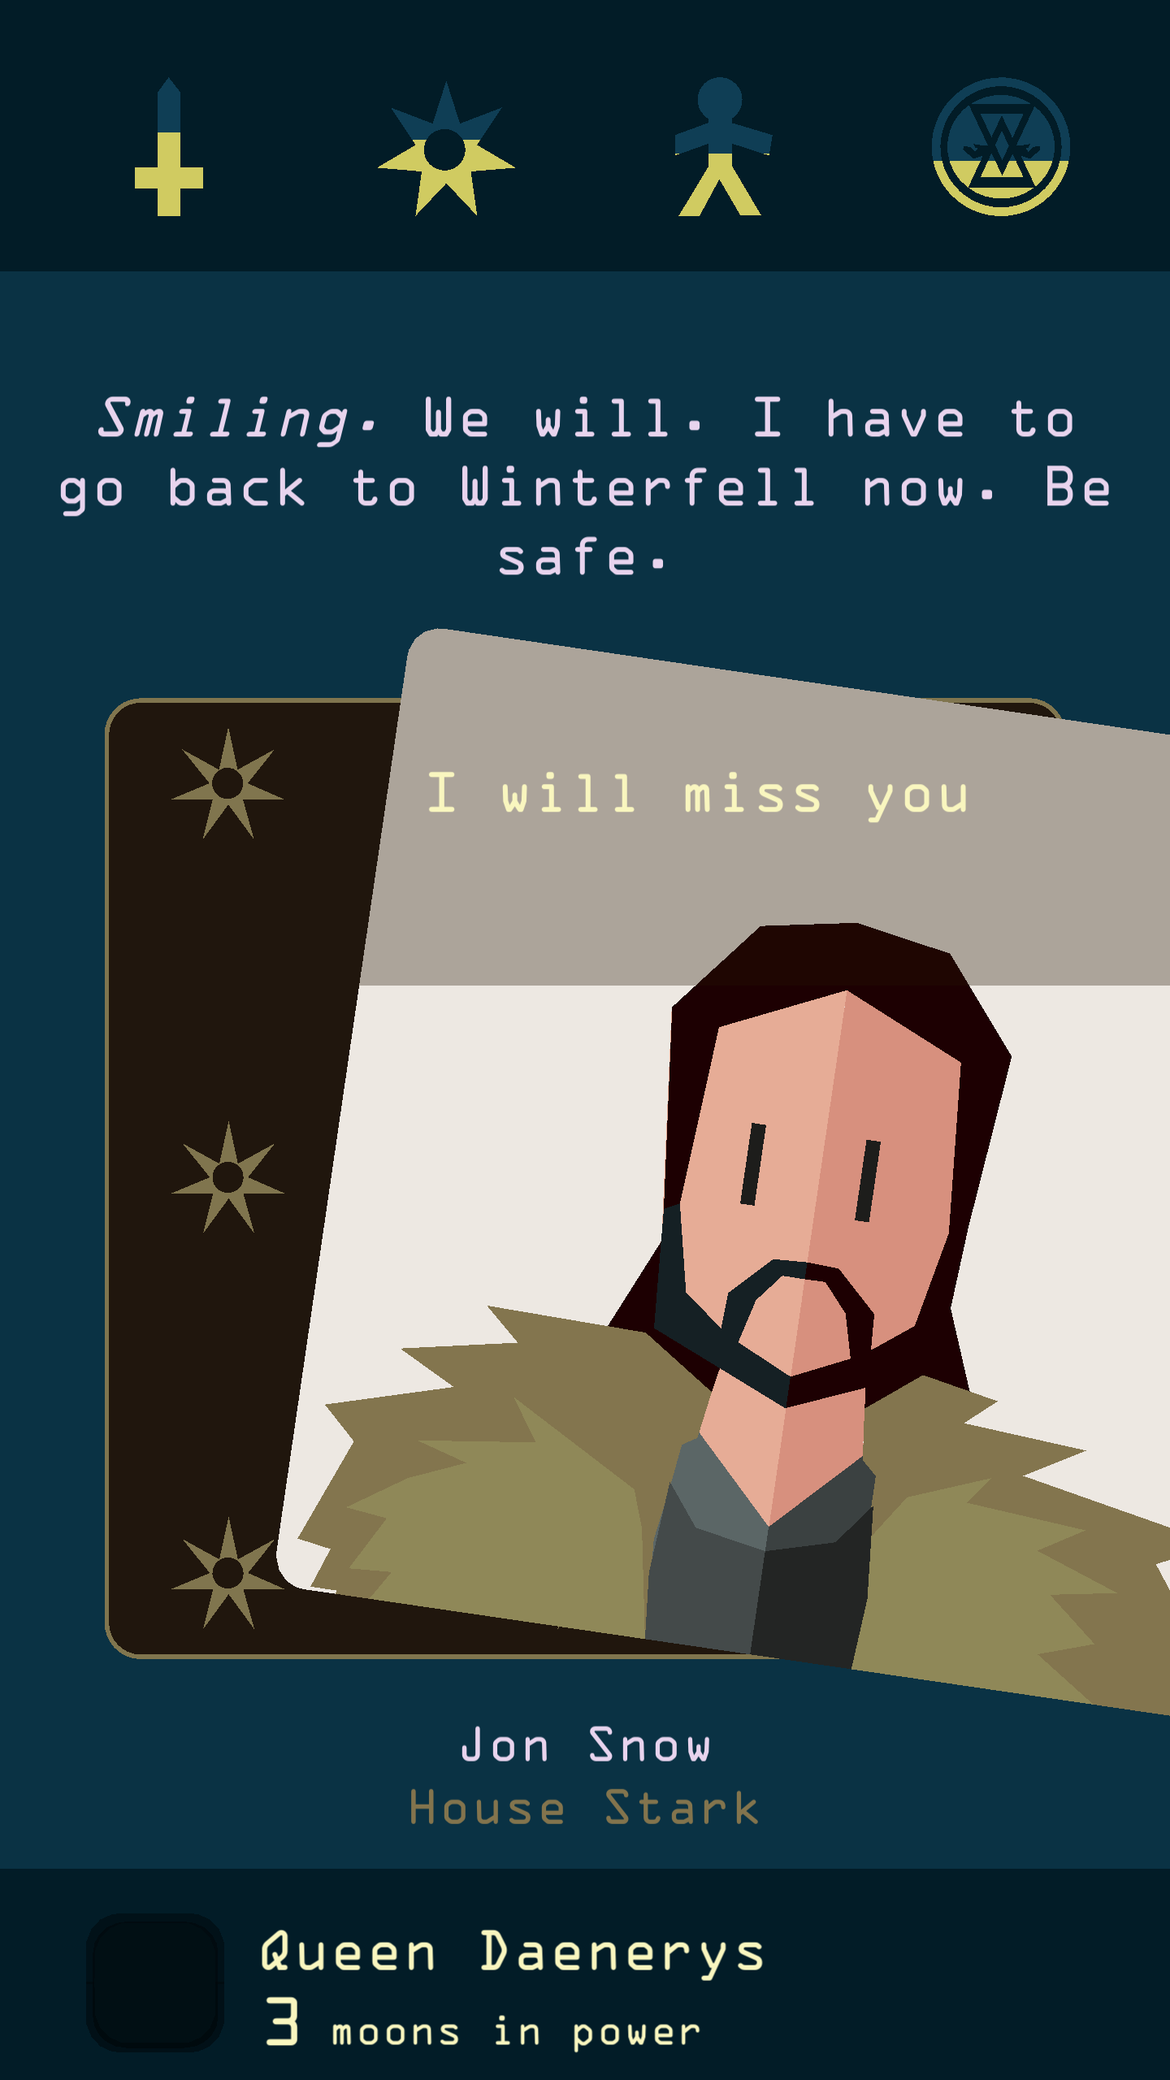 Jon Snow Reigns